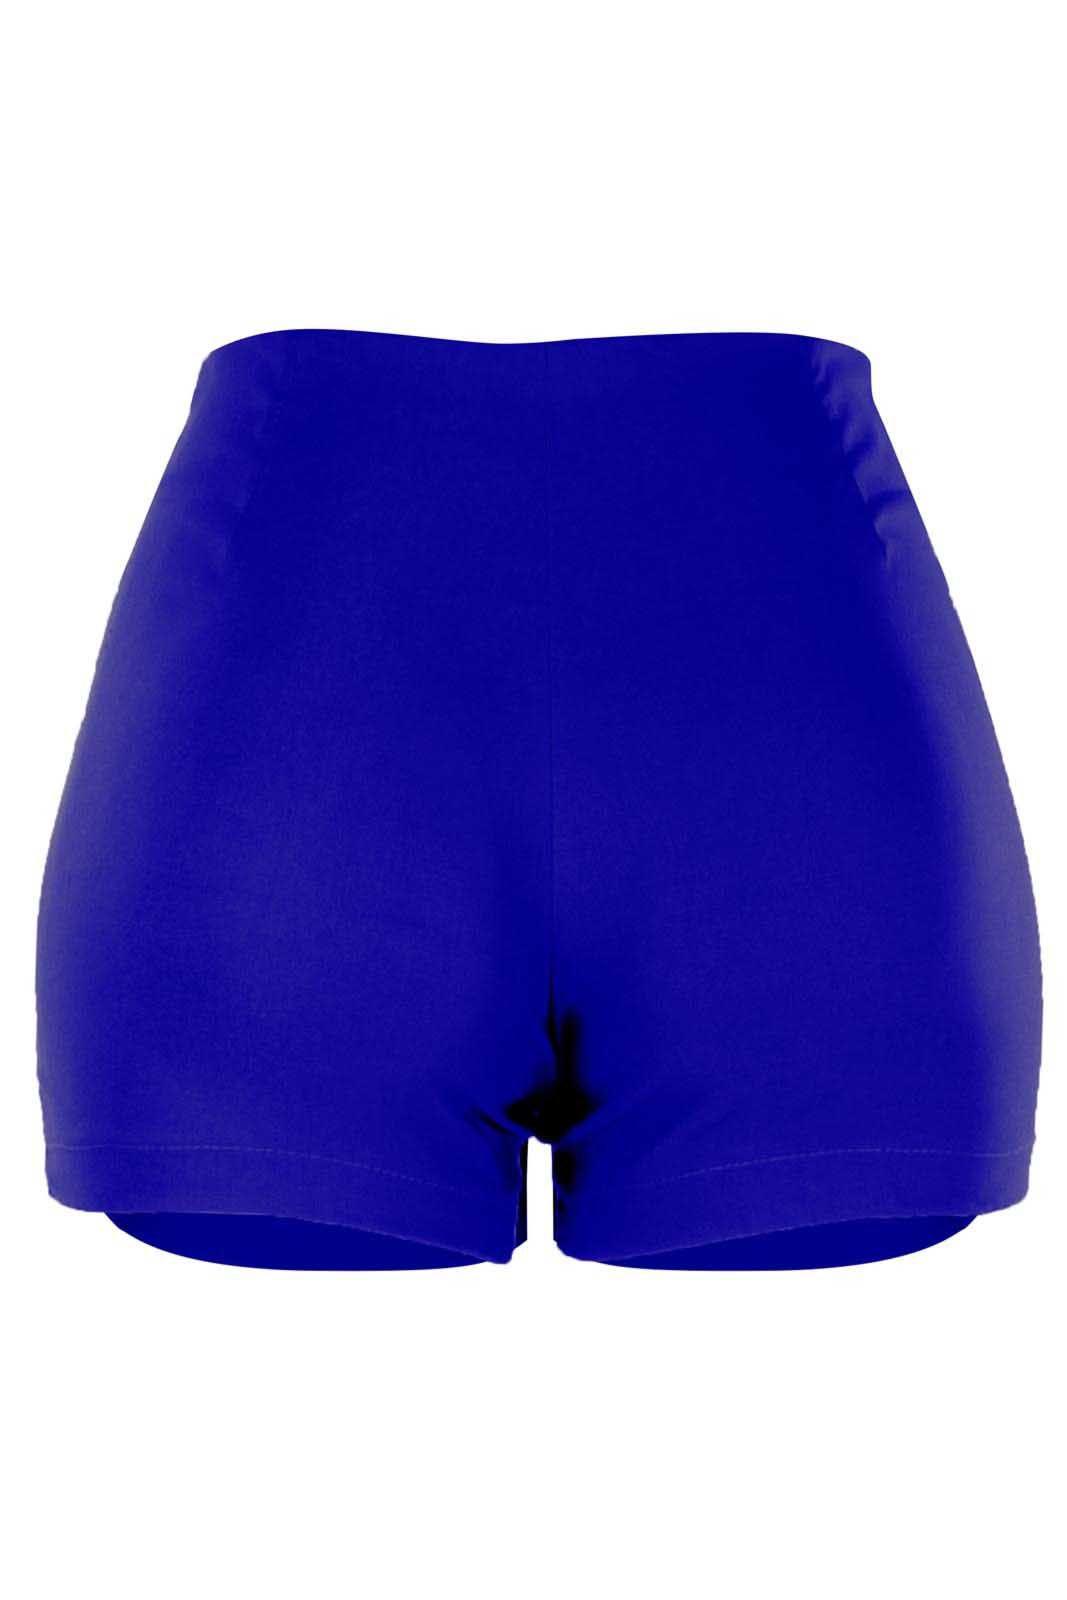 Short Outlet Dri Bengaline Casual Curto Drappeada Lateral Zíper Azul